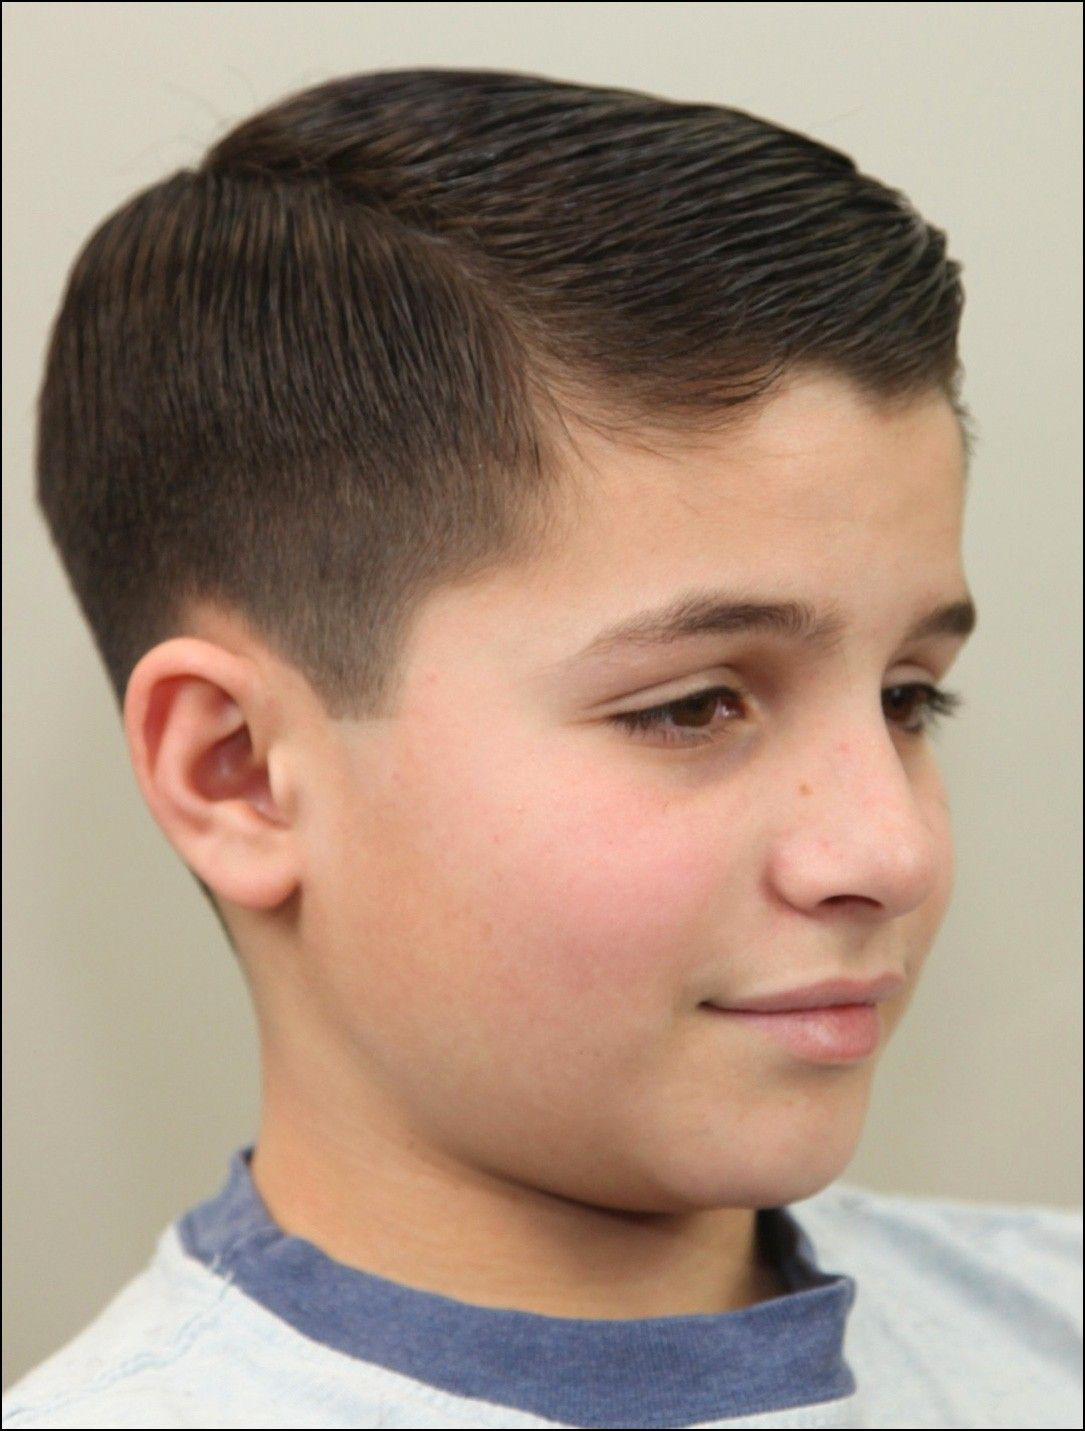 Easy Haircuts for Boys | Boy haircuts short, Little boy hairstyles, Boy hairstyles